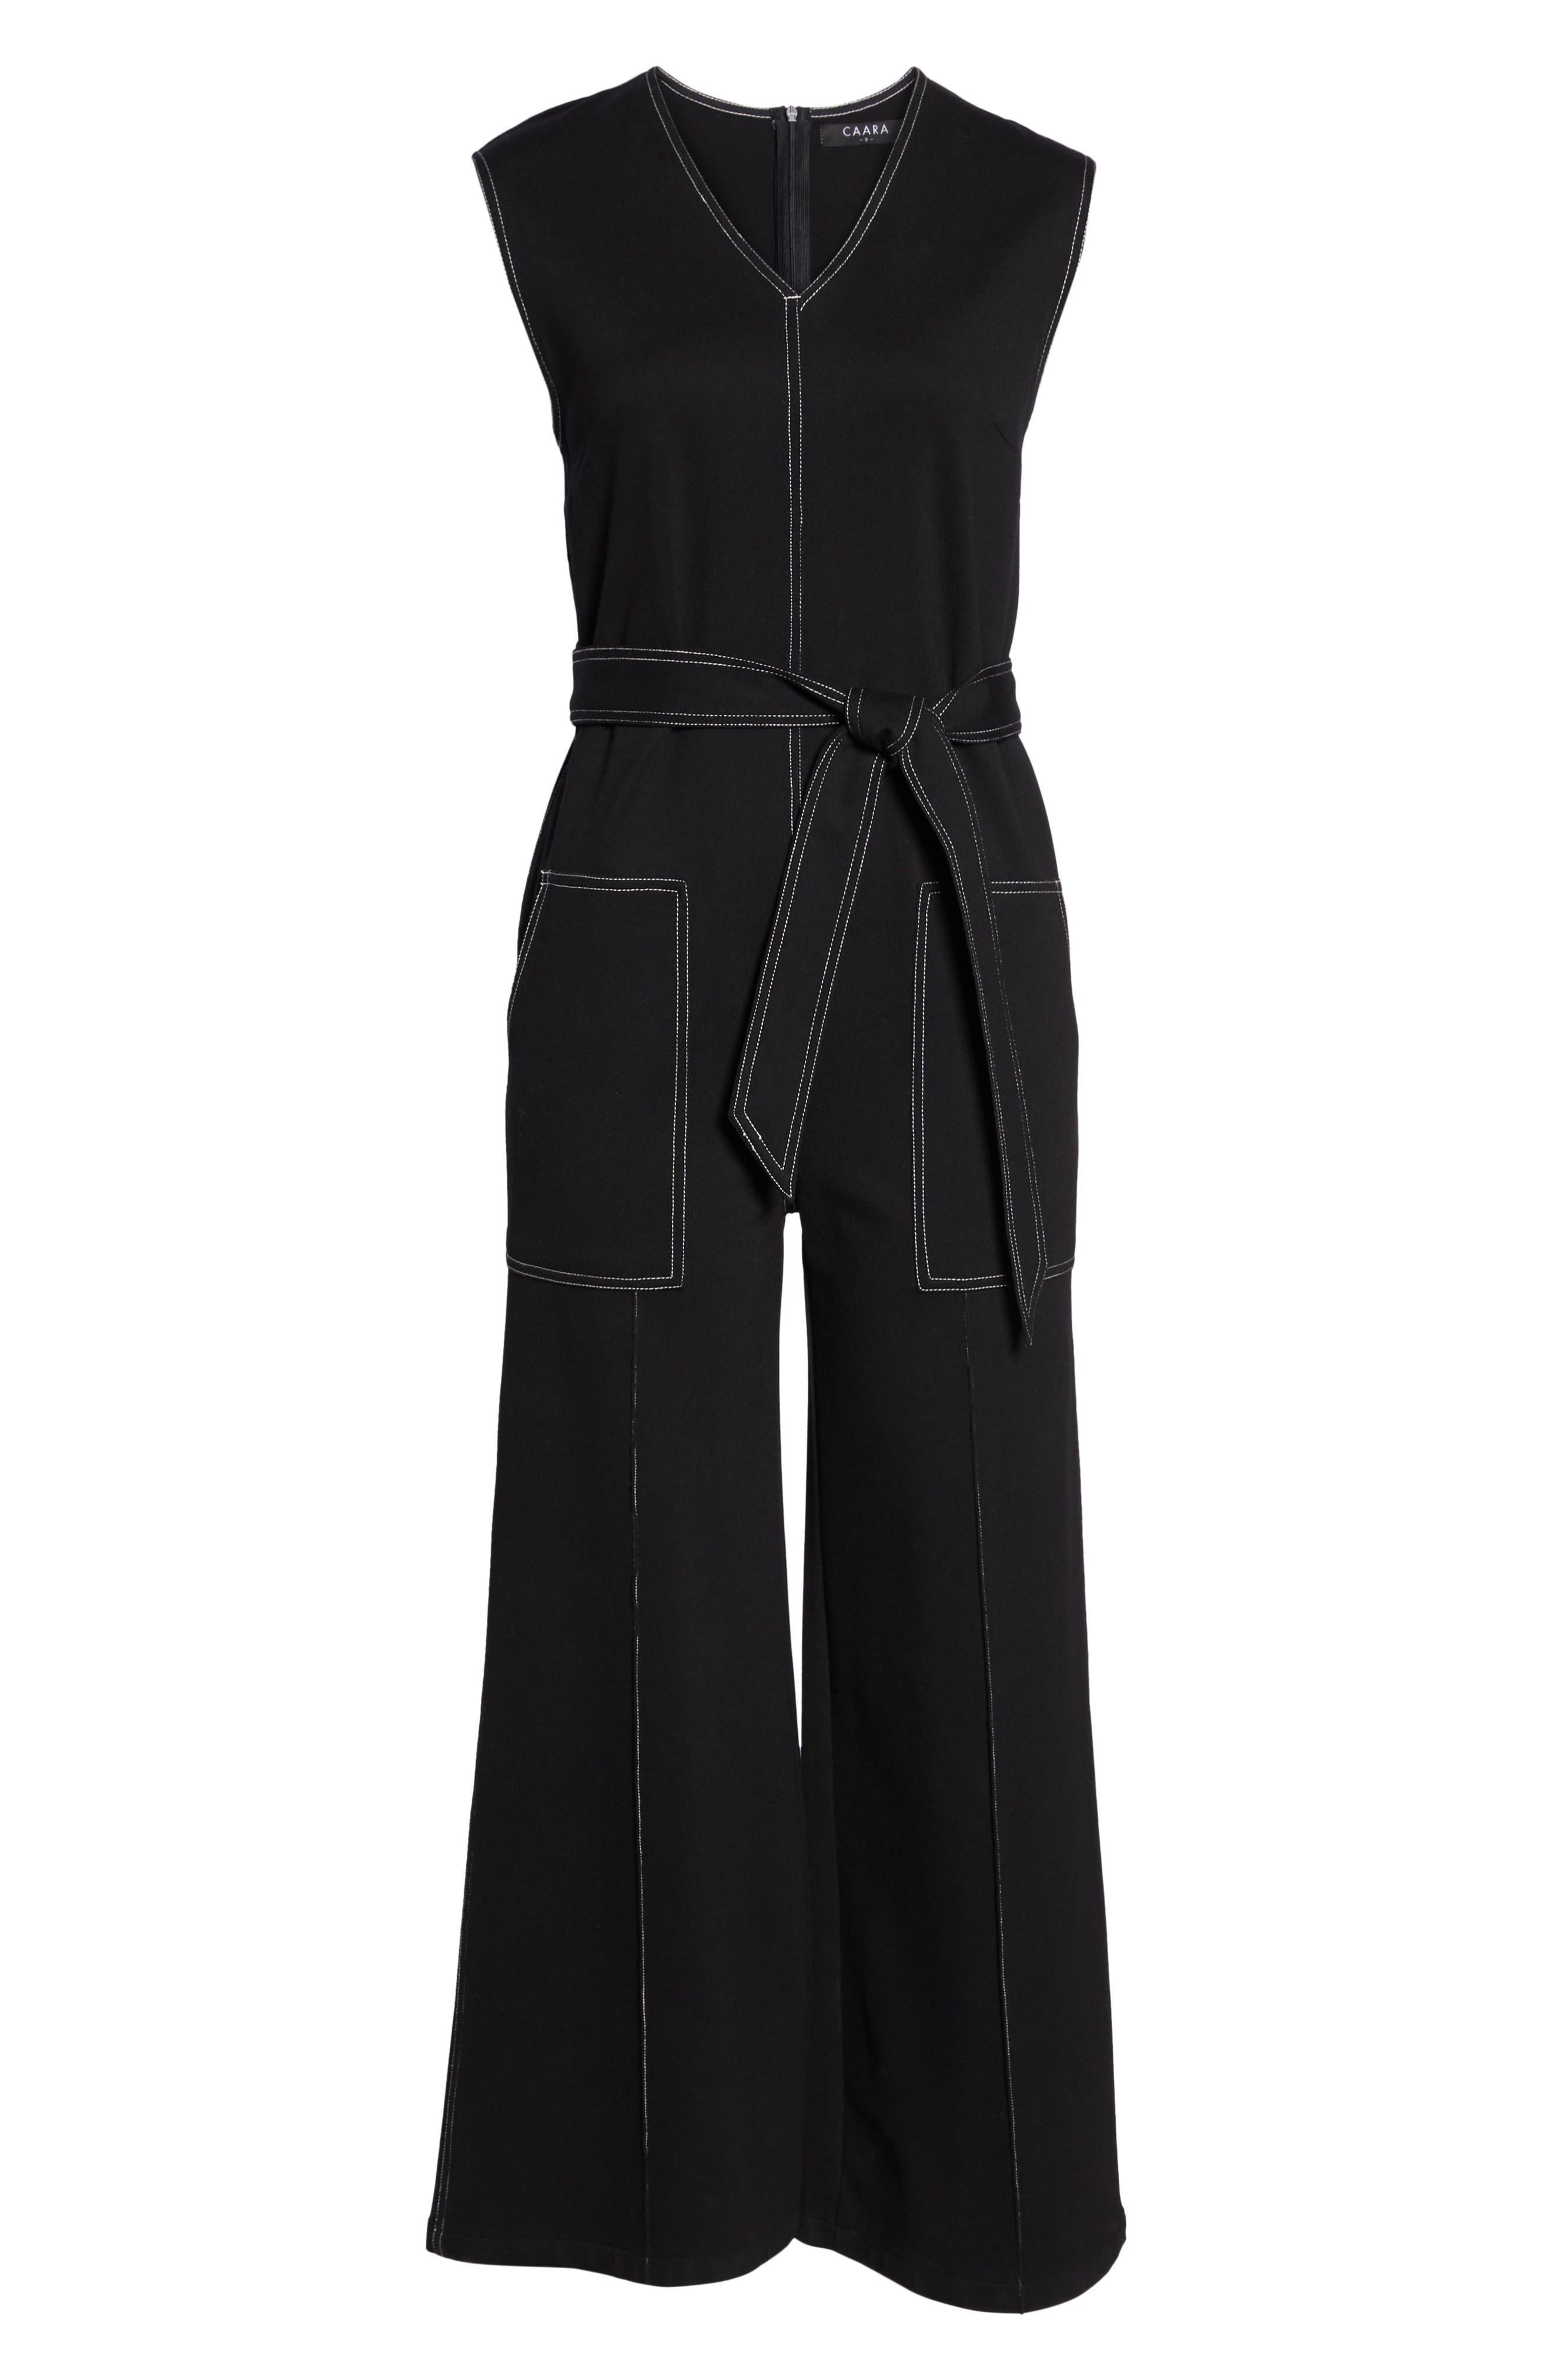 Playdate Stretch Knit Jumpsuit,                             Alternate thumbnail 6, color,                             Black